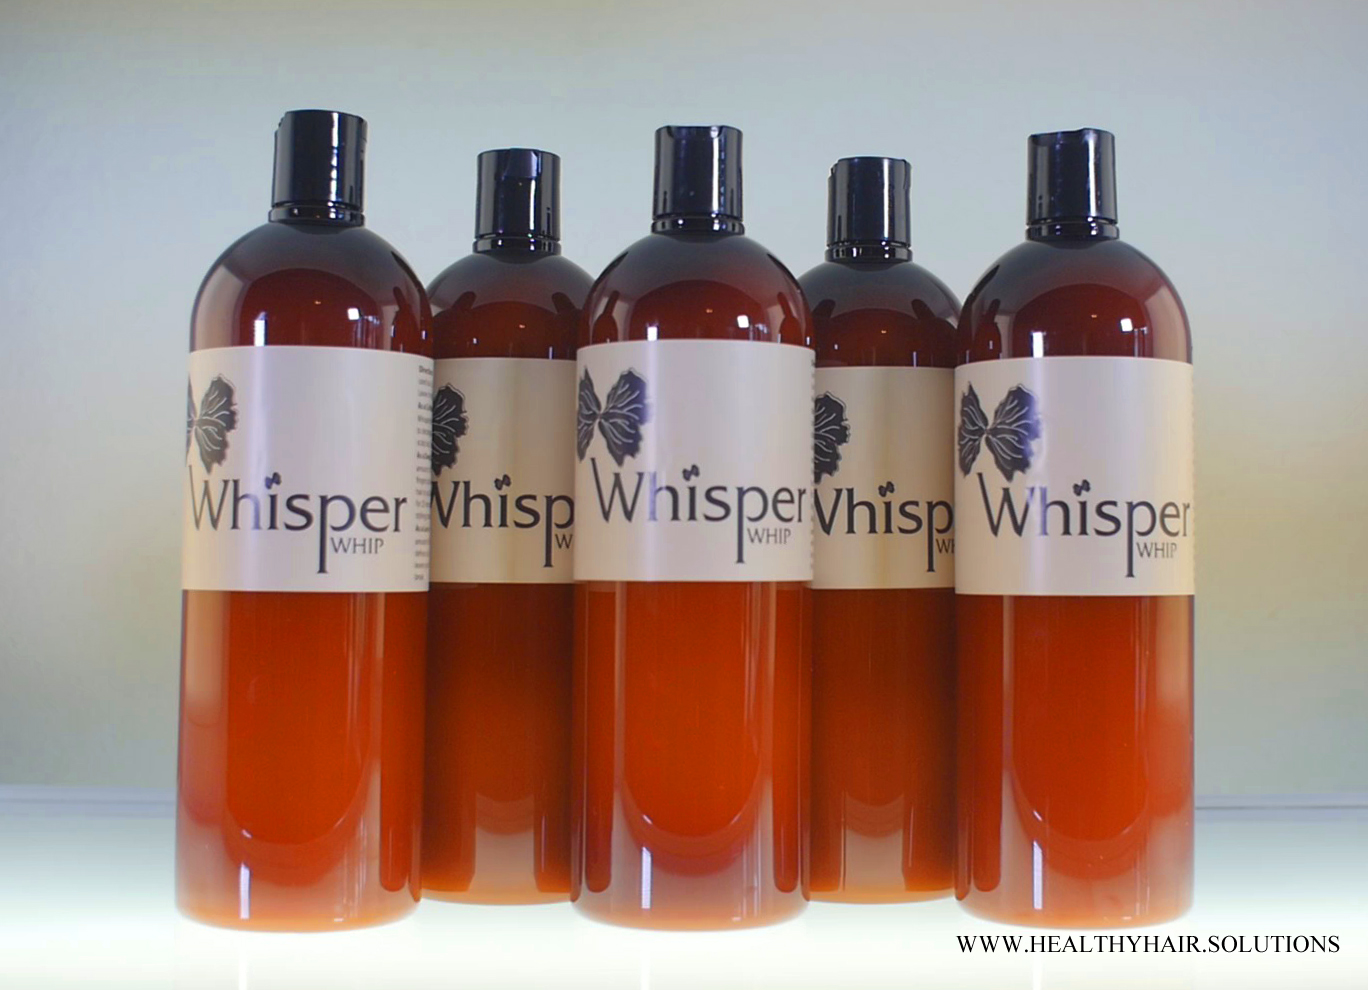 whisperwhip-vizion4.jpg